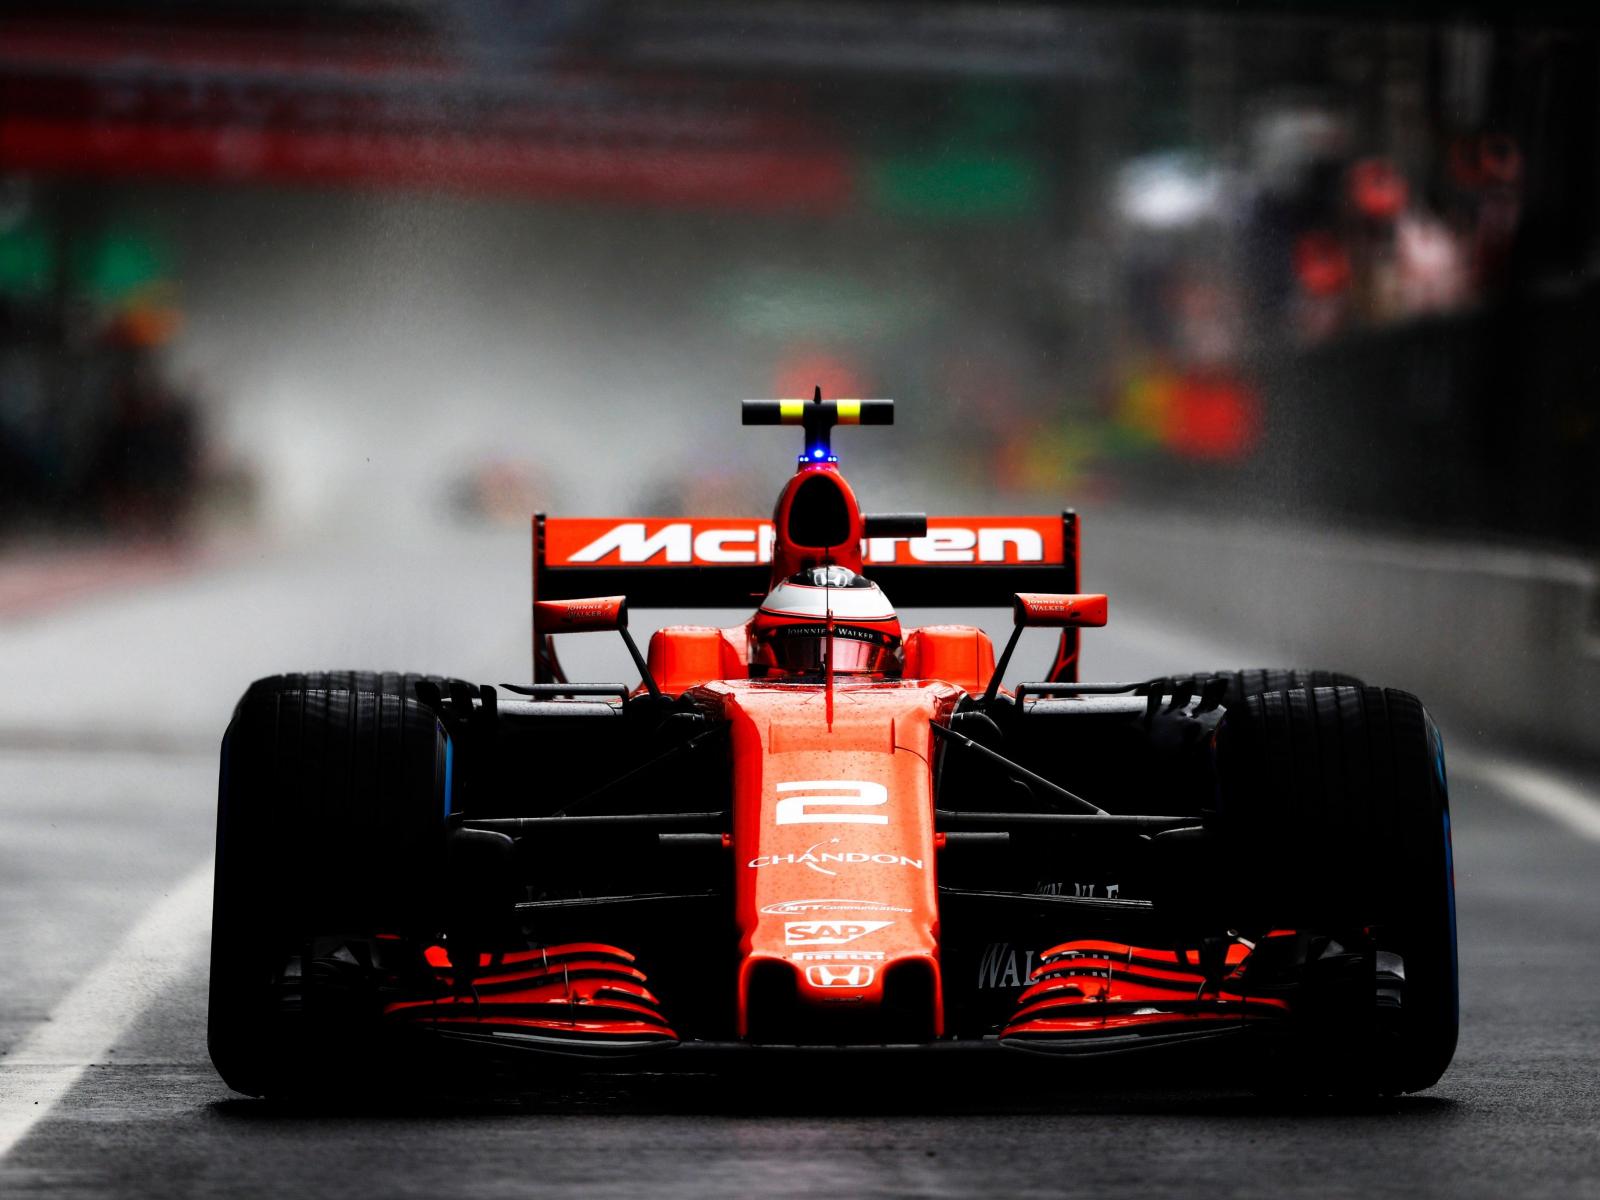 Download 1600x1200 Wallpaper Mclaren, Formula One, Car ...